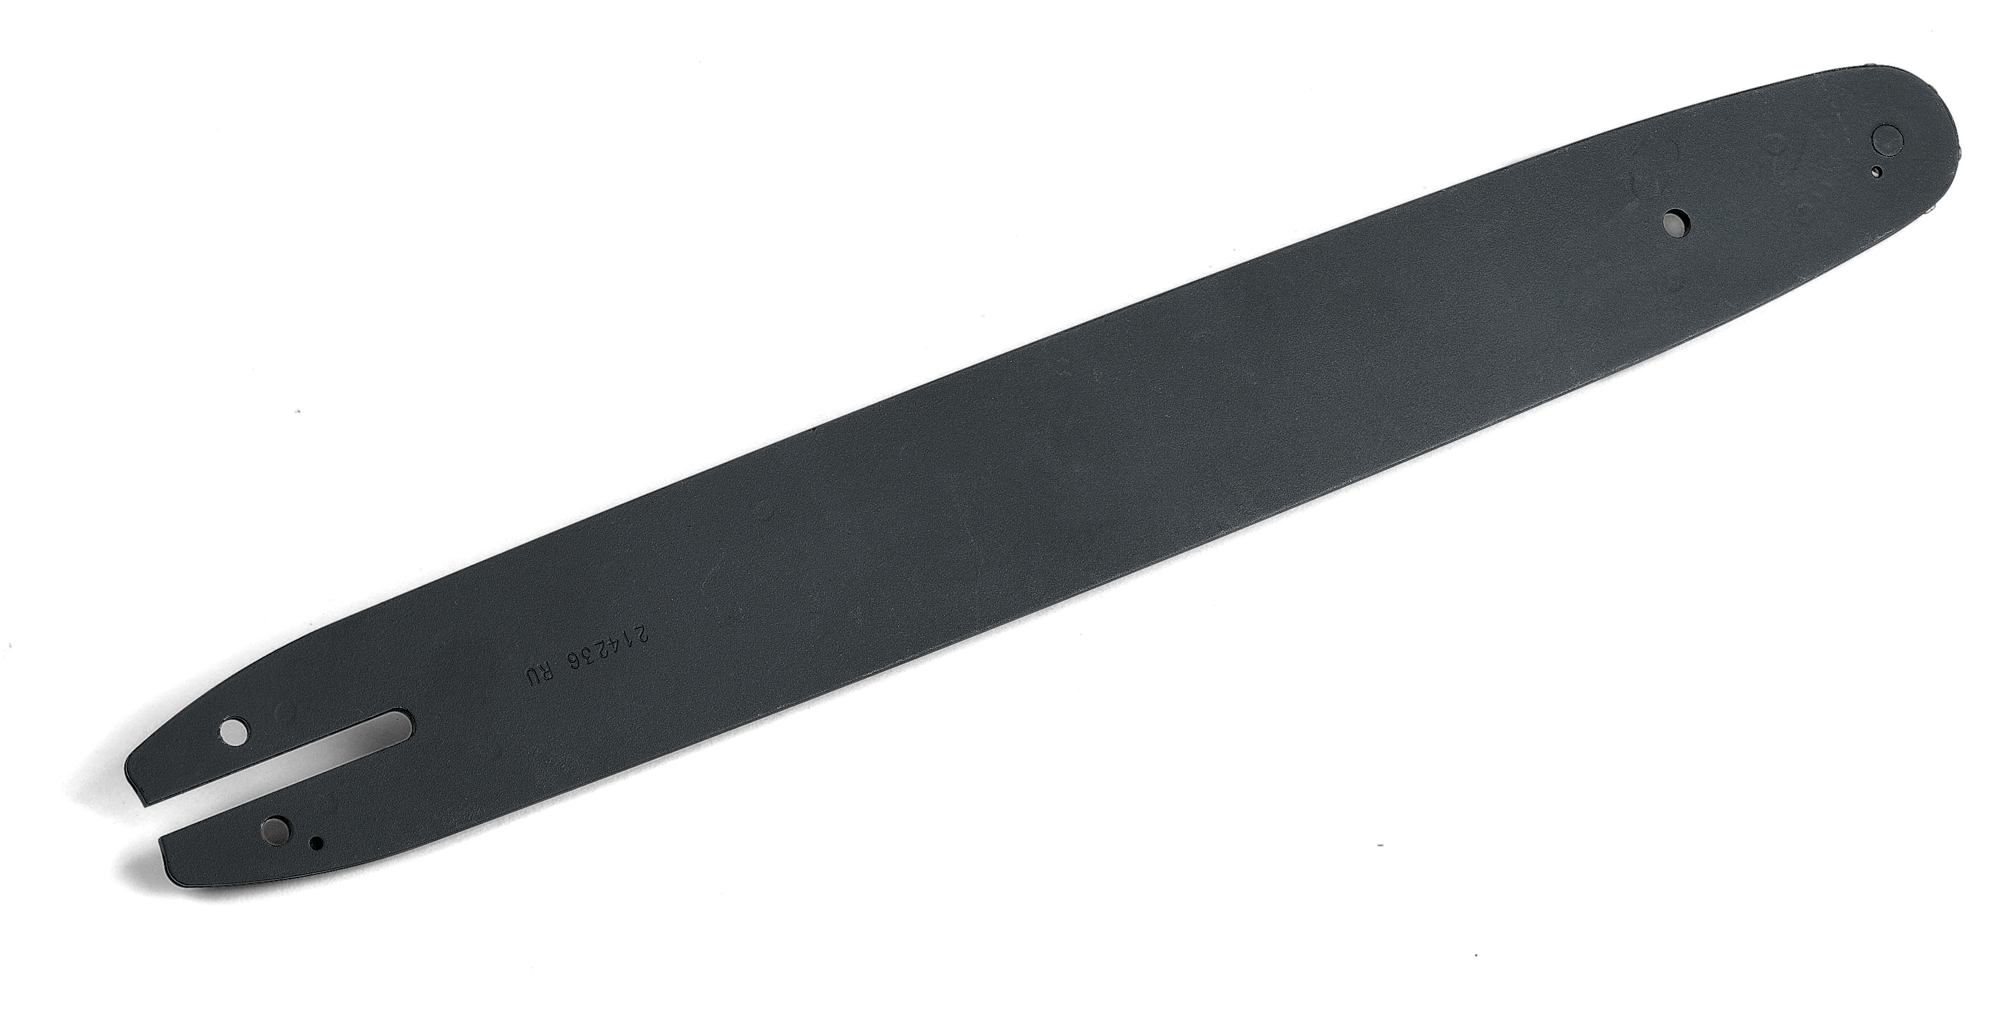 Model Number KSP10-FD2 14082 14085 and 14087 Spyker Broadcast Spreader Full Deflector Kit fits Spreaders Item Numbers 14081